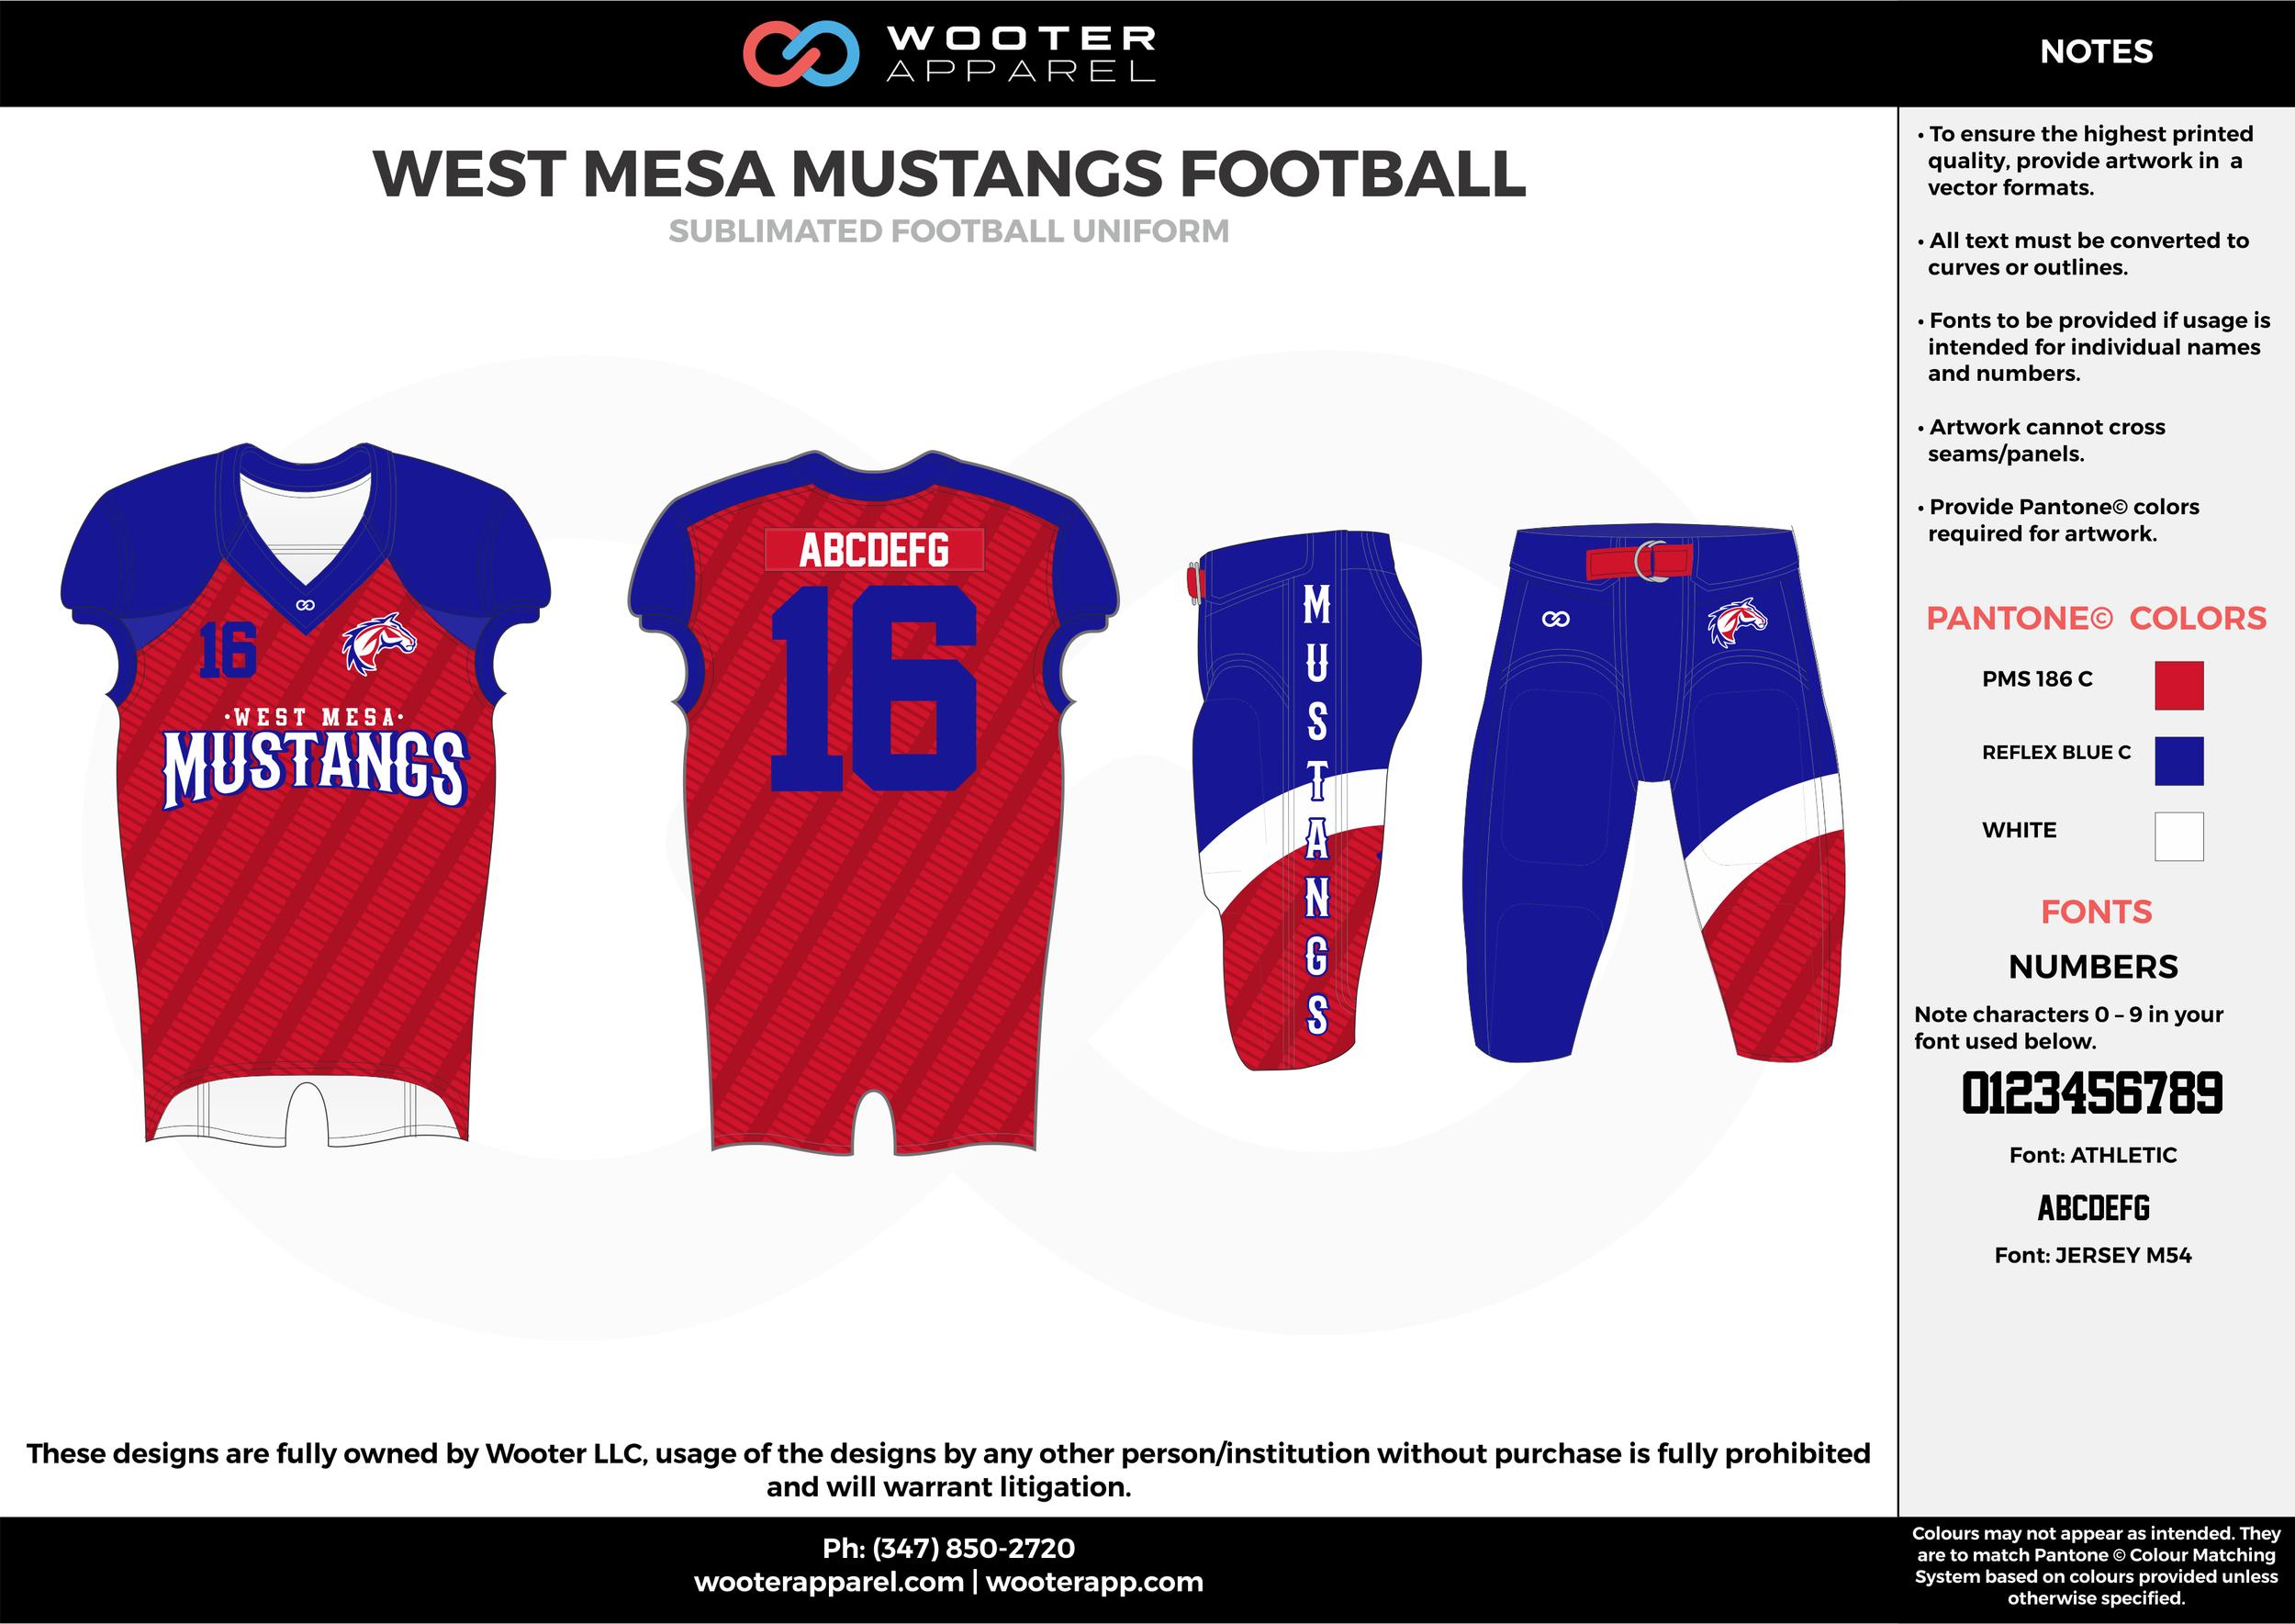 WEST MESA MUSTANGS FOOTBALL red blue white football uniforms jerseys pants